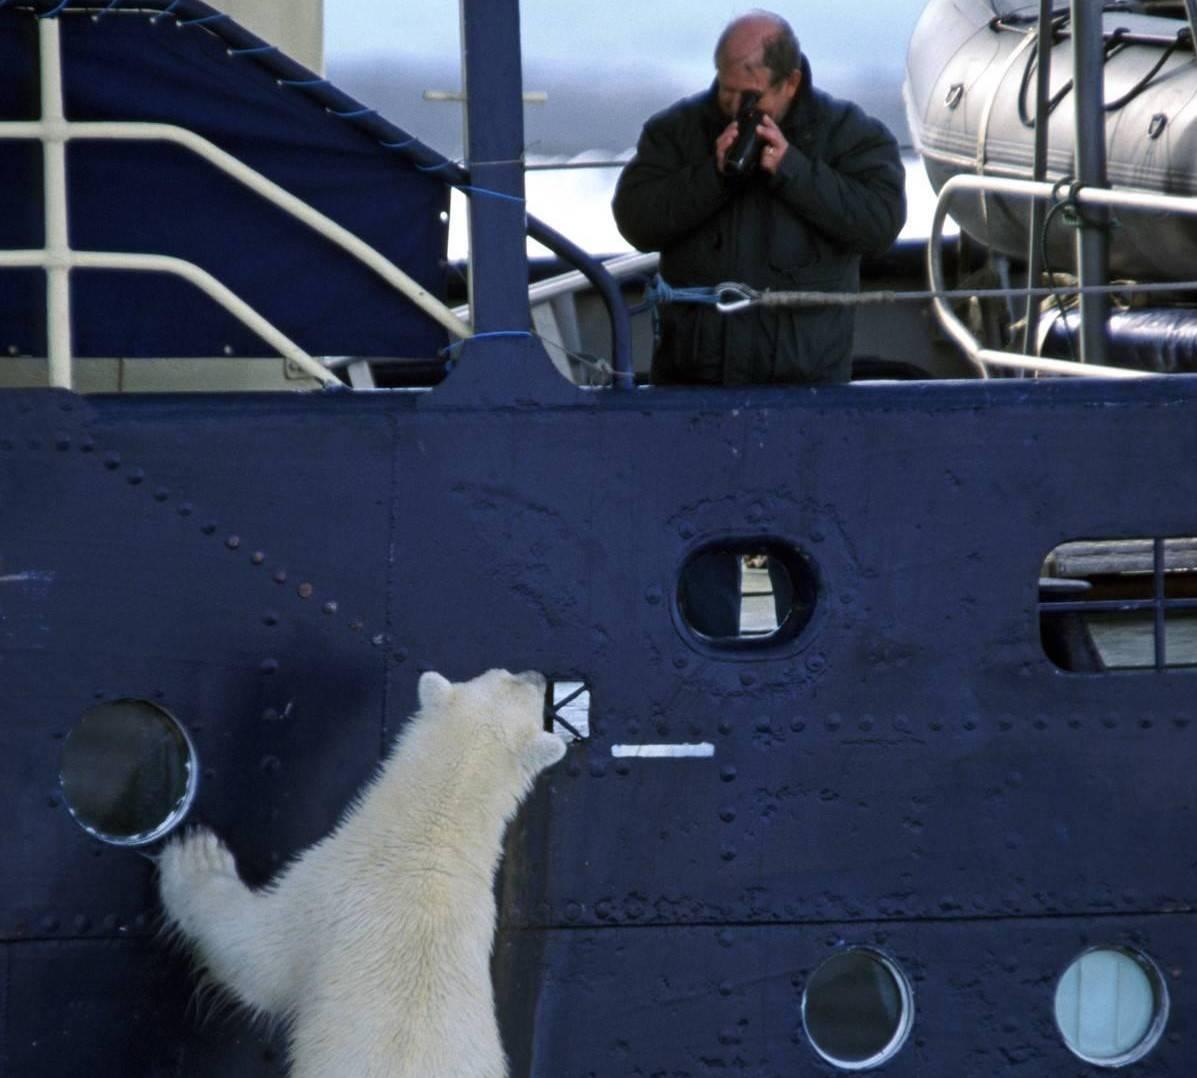 tourist-photographing-curious-polar-bear-ursus-maritimus.-29250